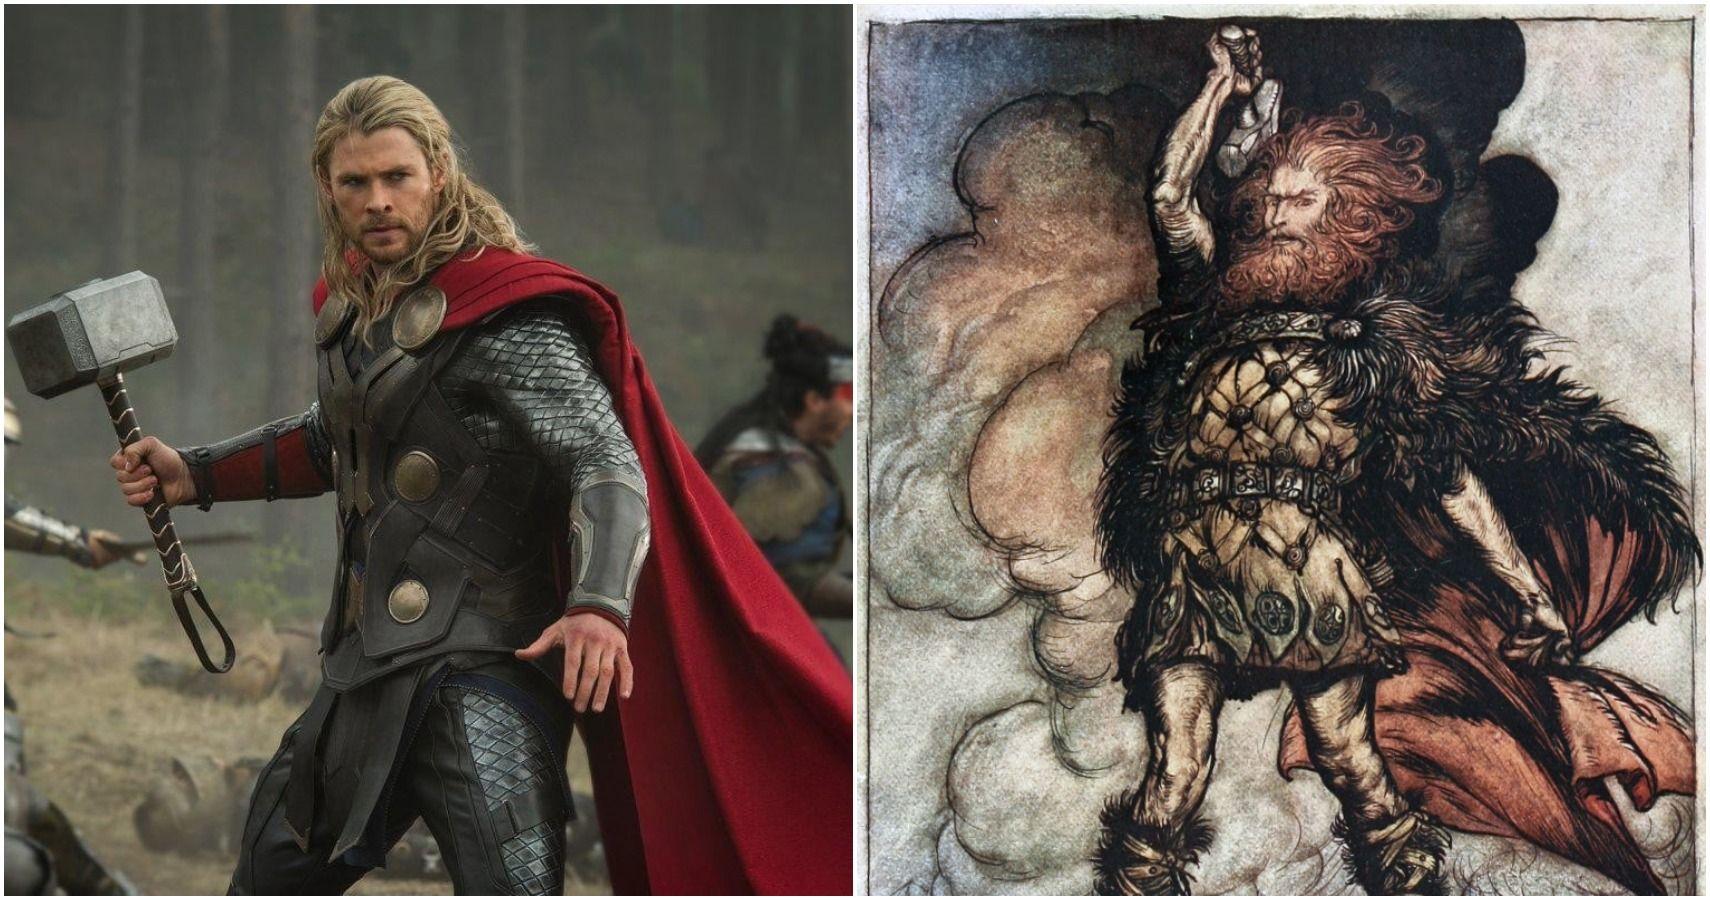 Thor from the MCU vs mythological representation